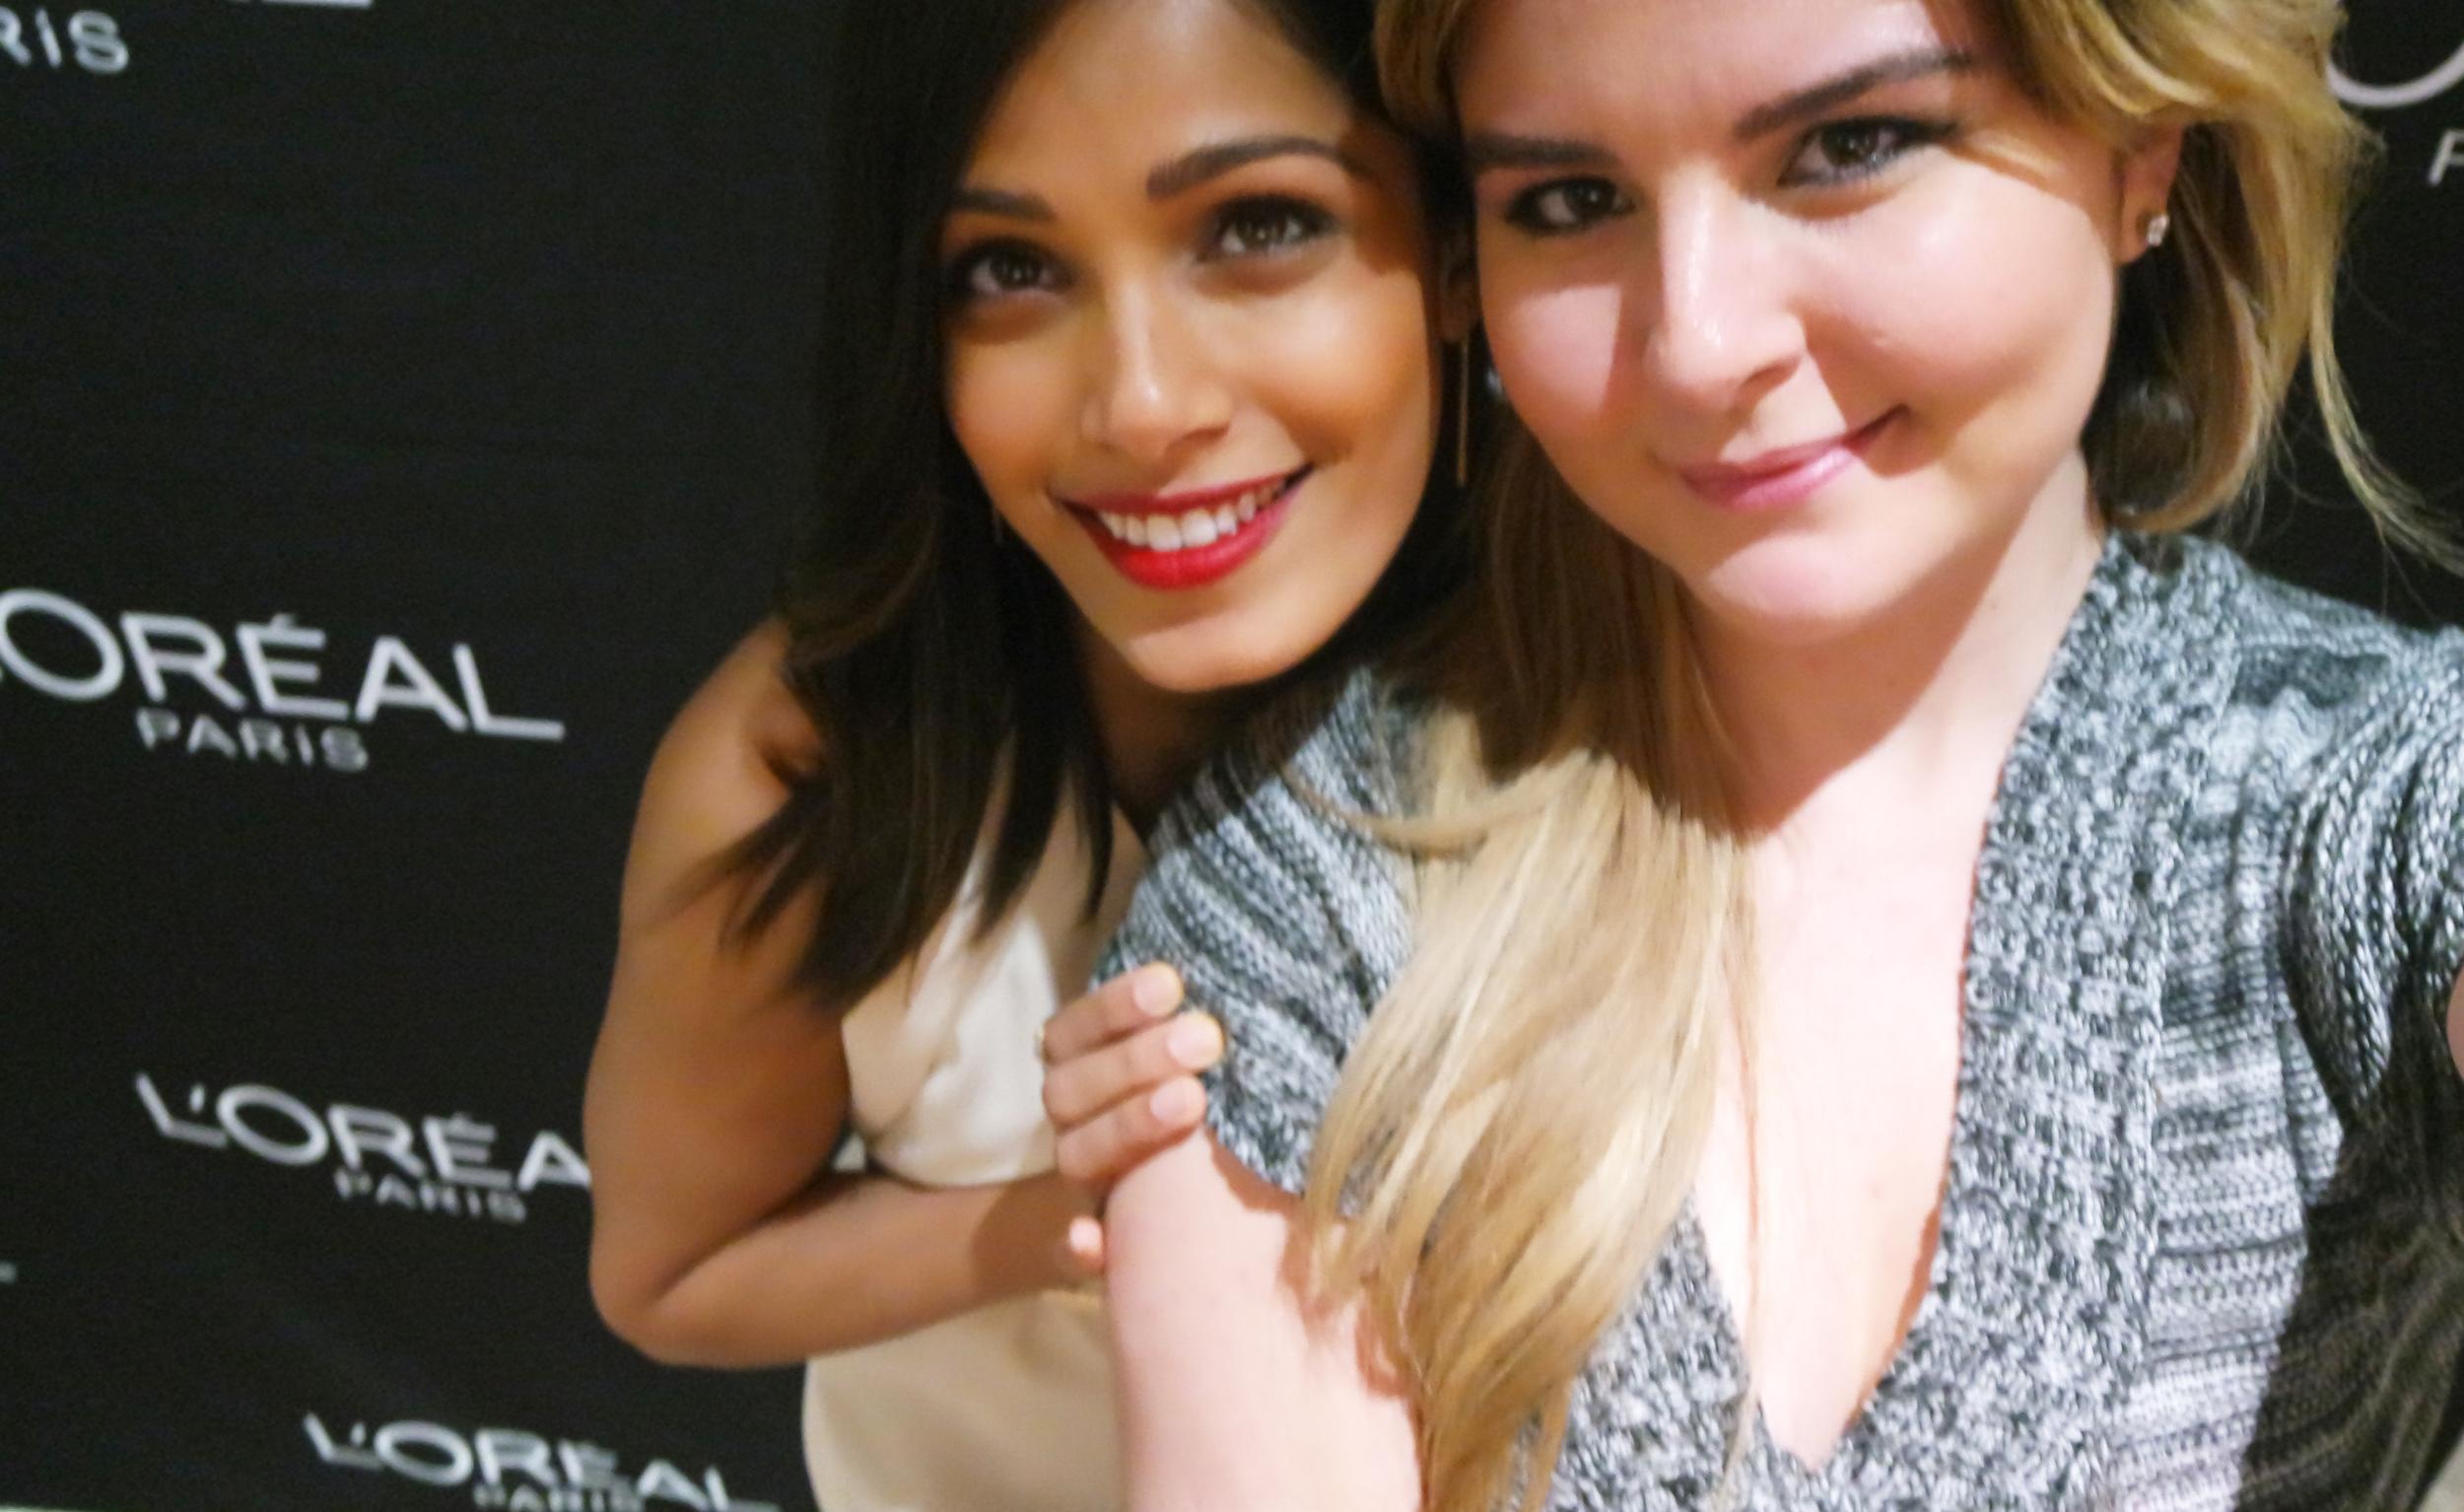 SELFIE! With actress Freida Pinto